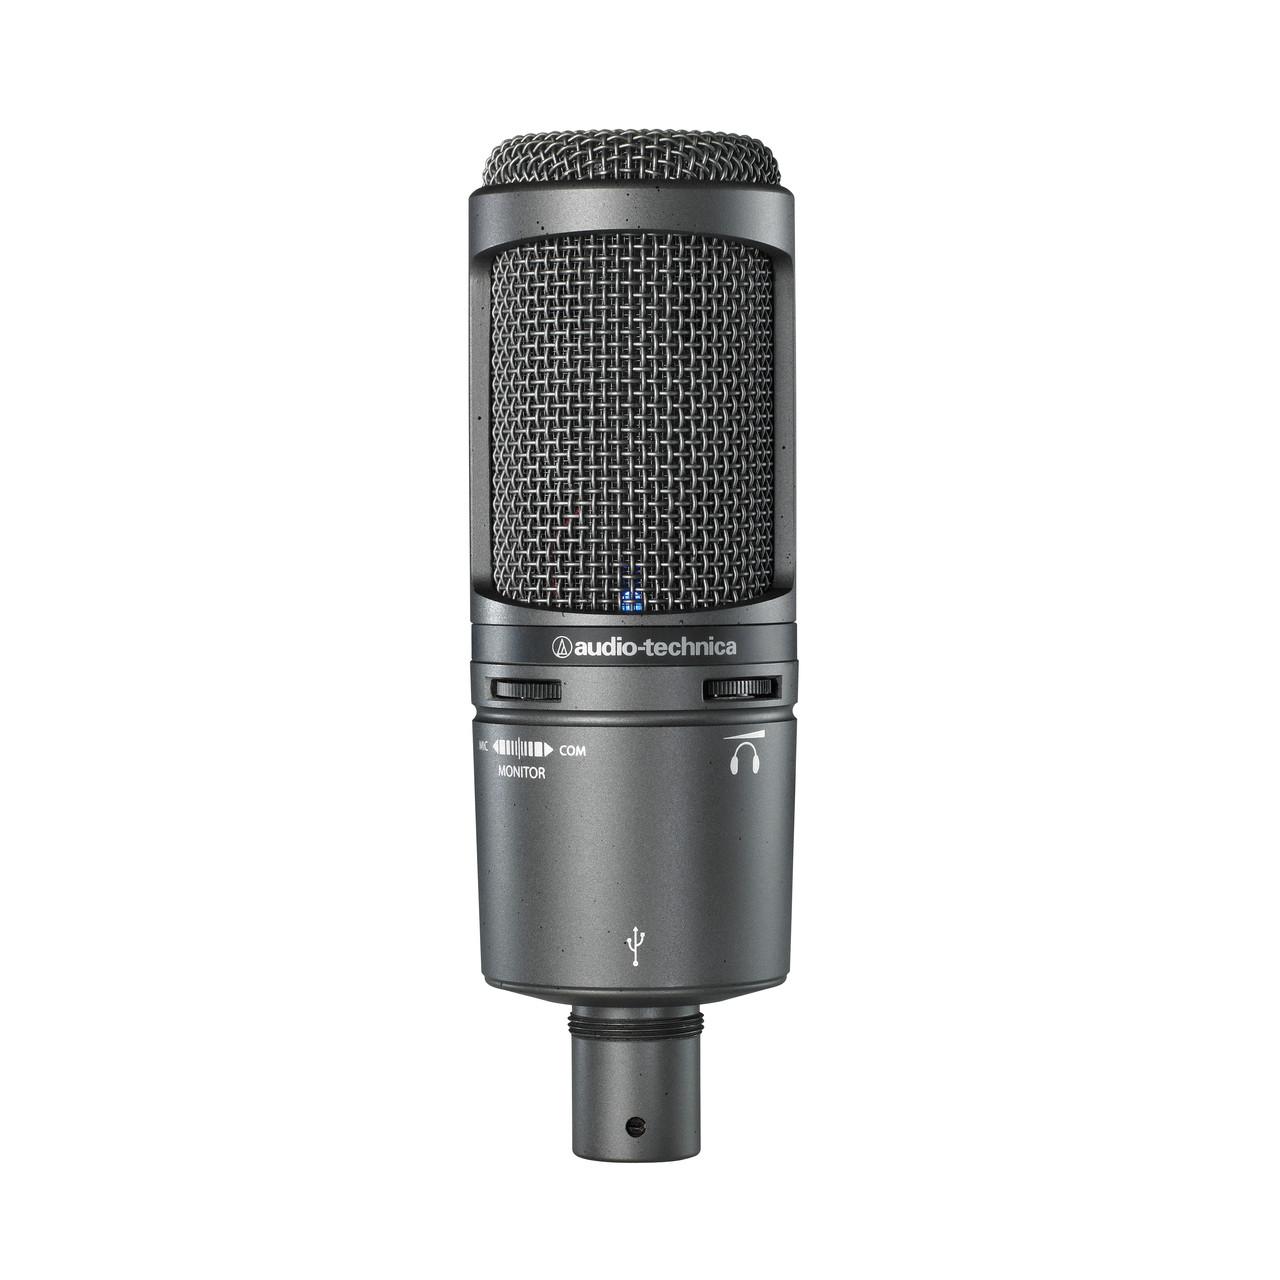 Audio-Technica 2020 USB+ Cardioid Condenser USB Microphone